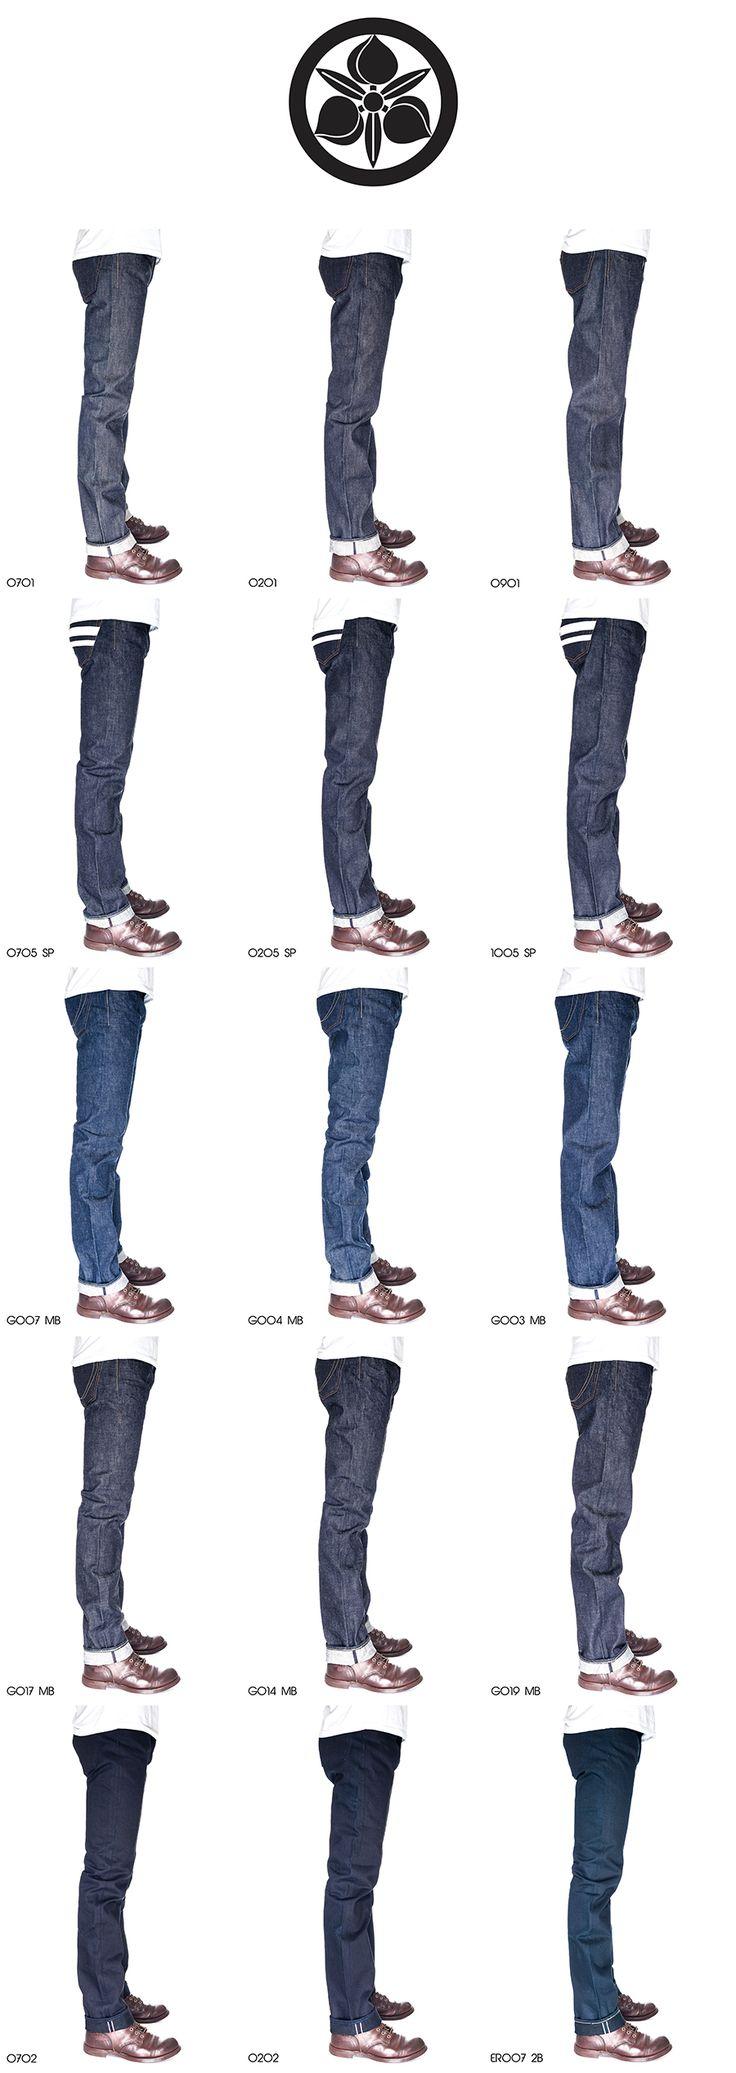 Product Line Up - Momotaro Jeans, Handmade in Kojima, Okayama, Japan.